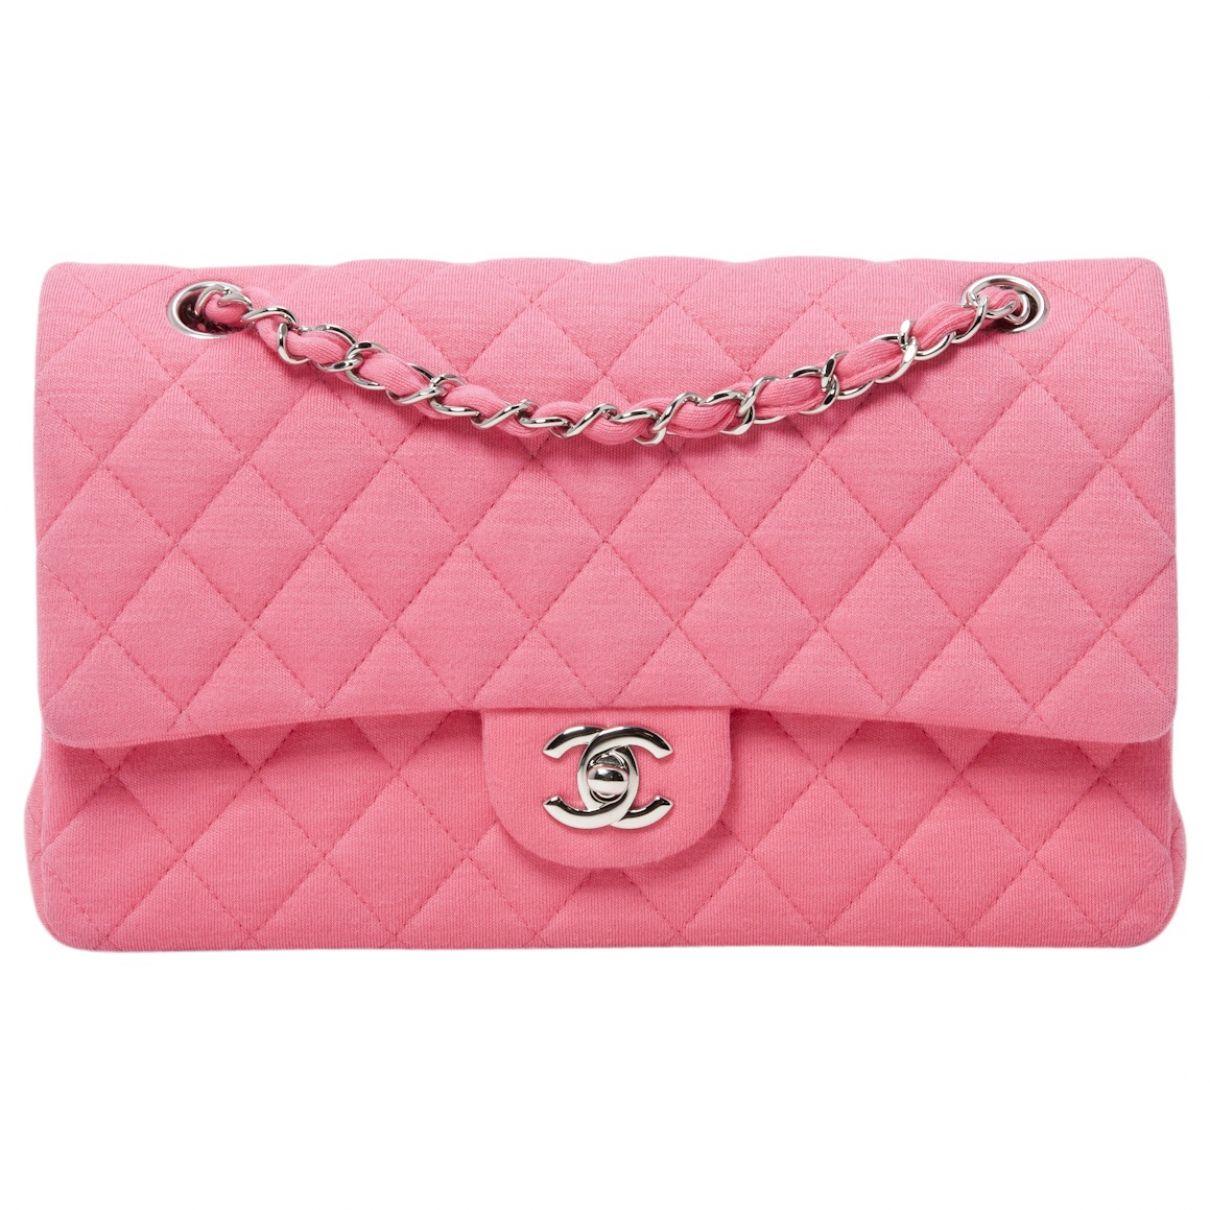 1fc18192f6dd CHANEL Pink Handbag Timeless | Vestiaire Collective | PINK | Pink ...